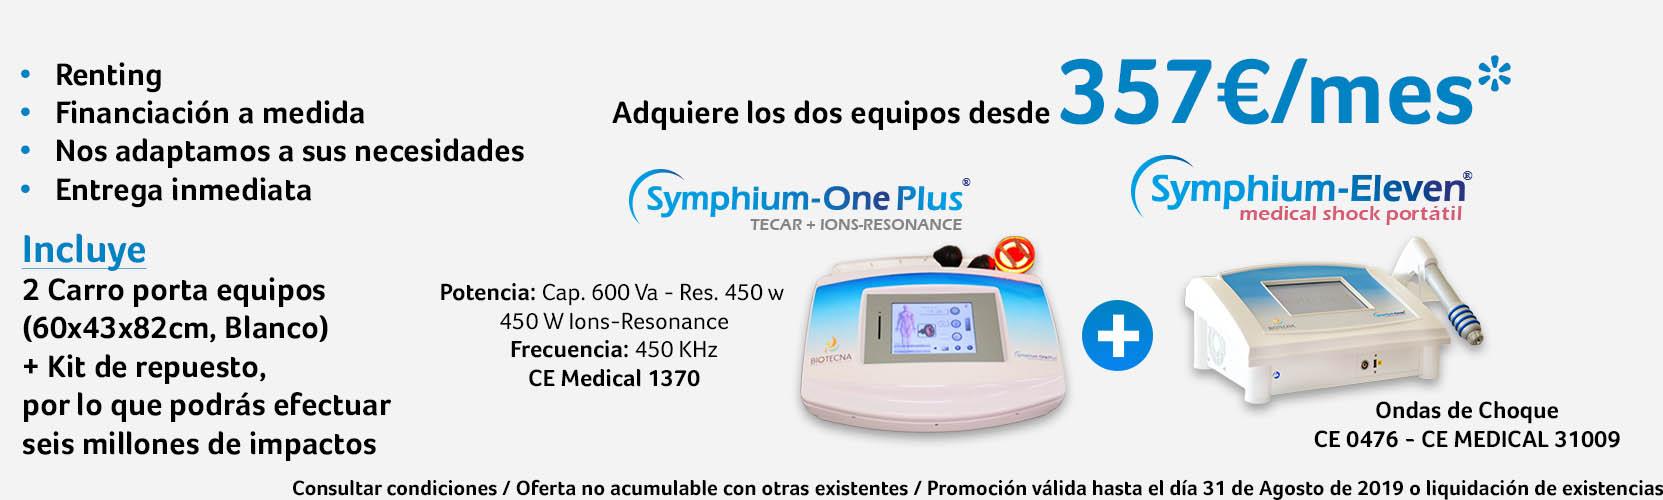 Biotecna-Ofertas-Agosto-2019-Symphium-One-Plus-1